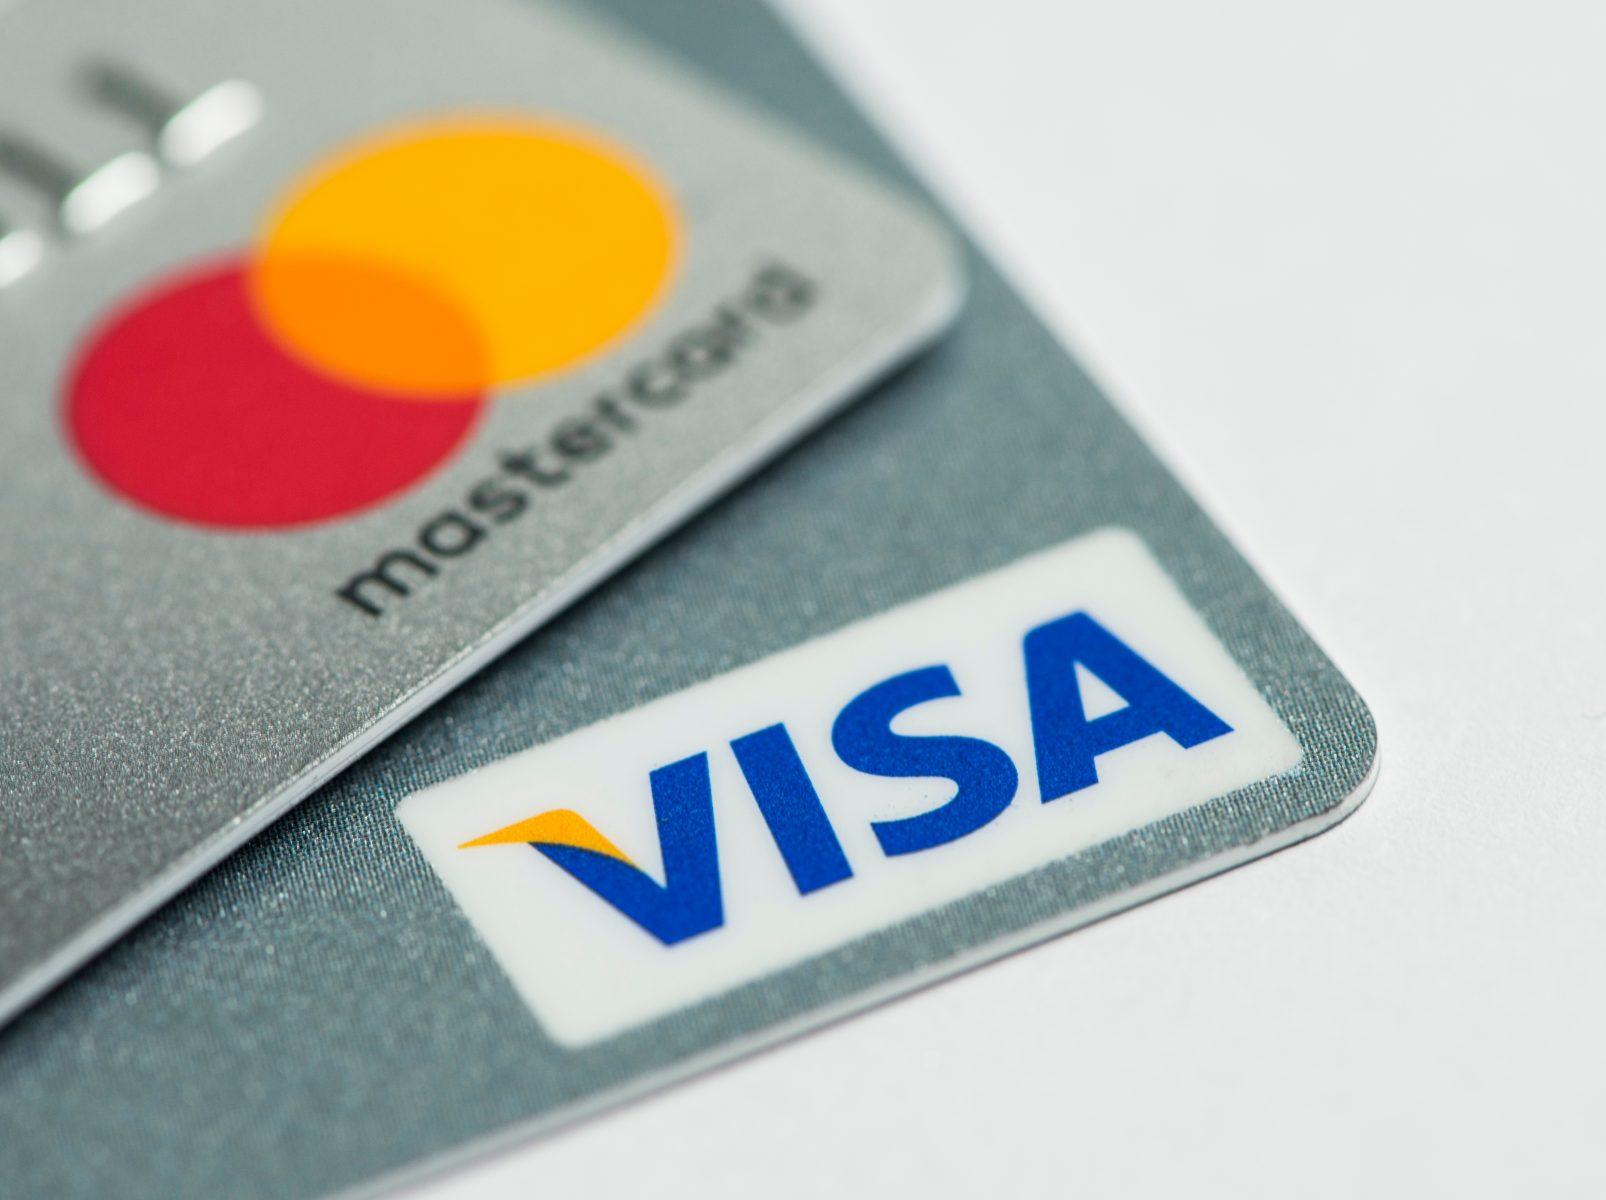 Visa And Mastercard Gift Card Deals Million Mile Secrets